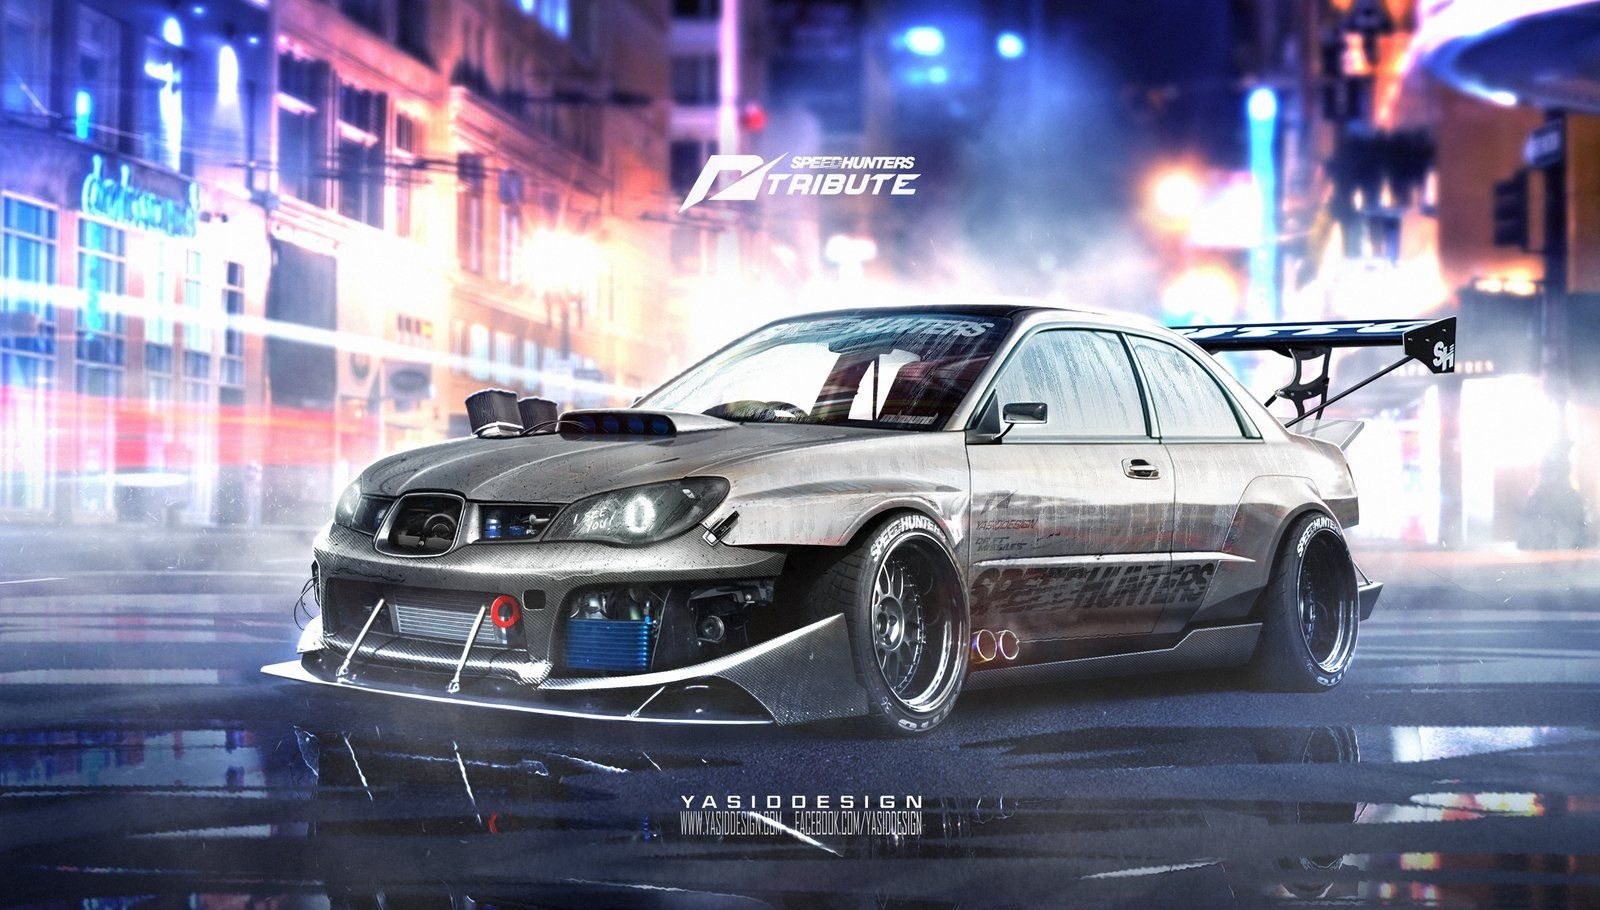 Artstation speedhunters mazda rx7 fd3s need for speed tribute yasid oozeear ilustra oes illustration pinterest rx7 mazda and cars